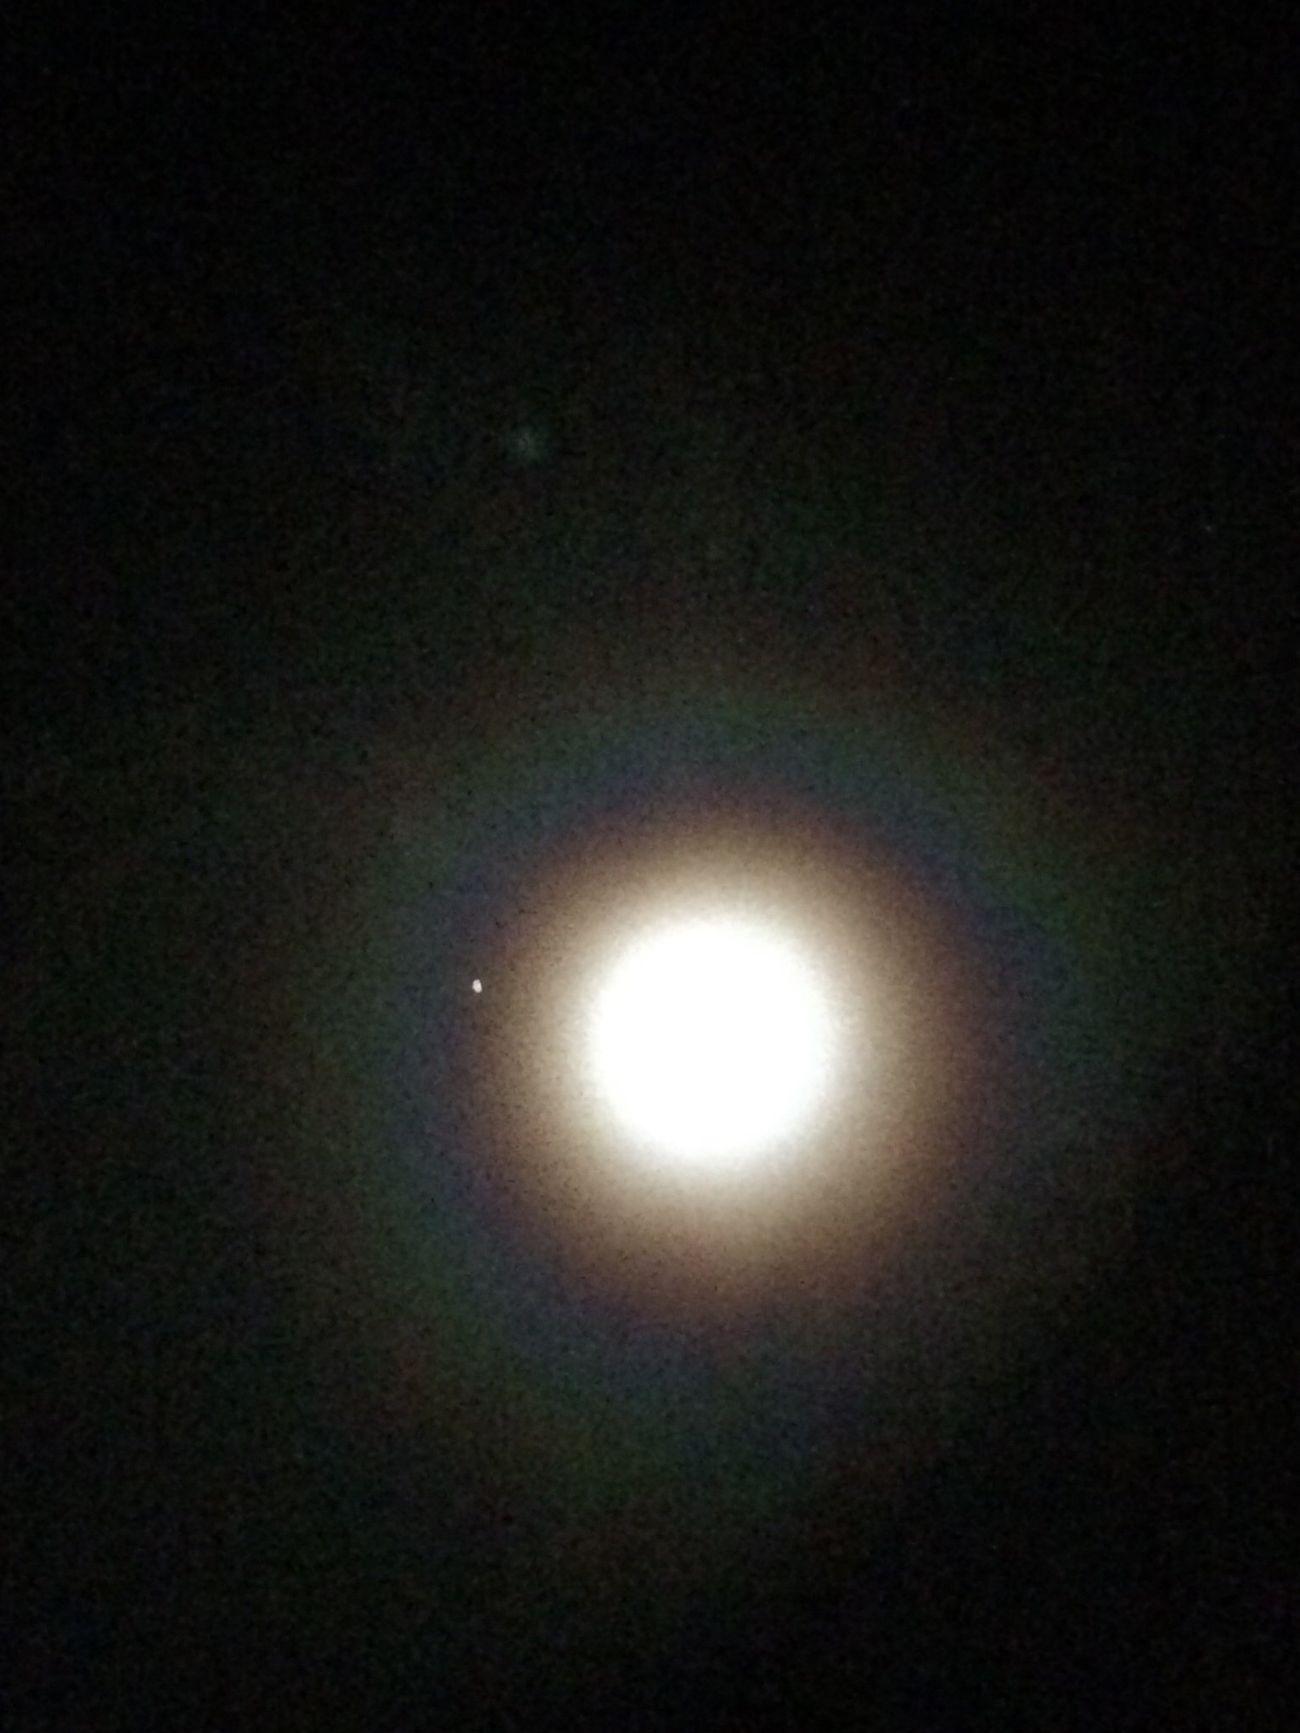 Guarda che luna🌚 Spectacle Paesaggio Meraviglia Photographer Photo Art Fabolous Special Photography Very Beautiful Spetacular Beautiful Moon